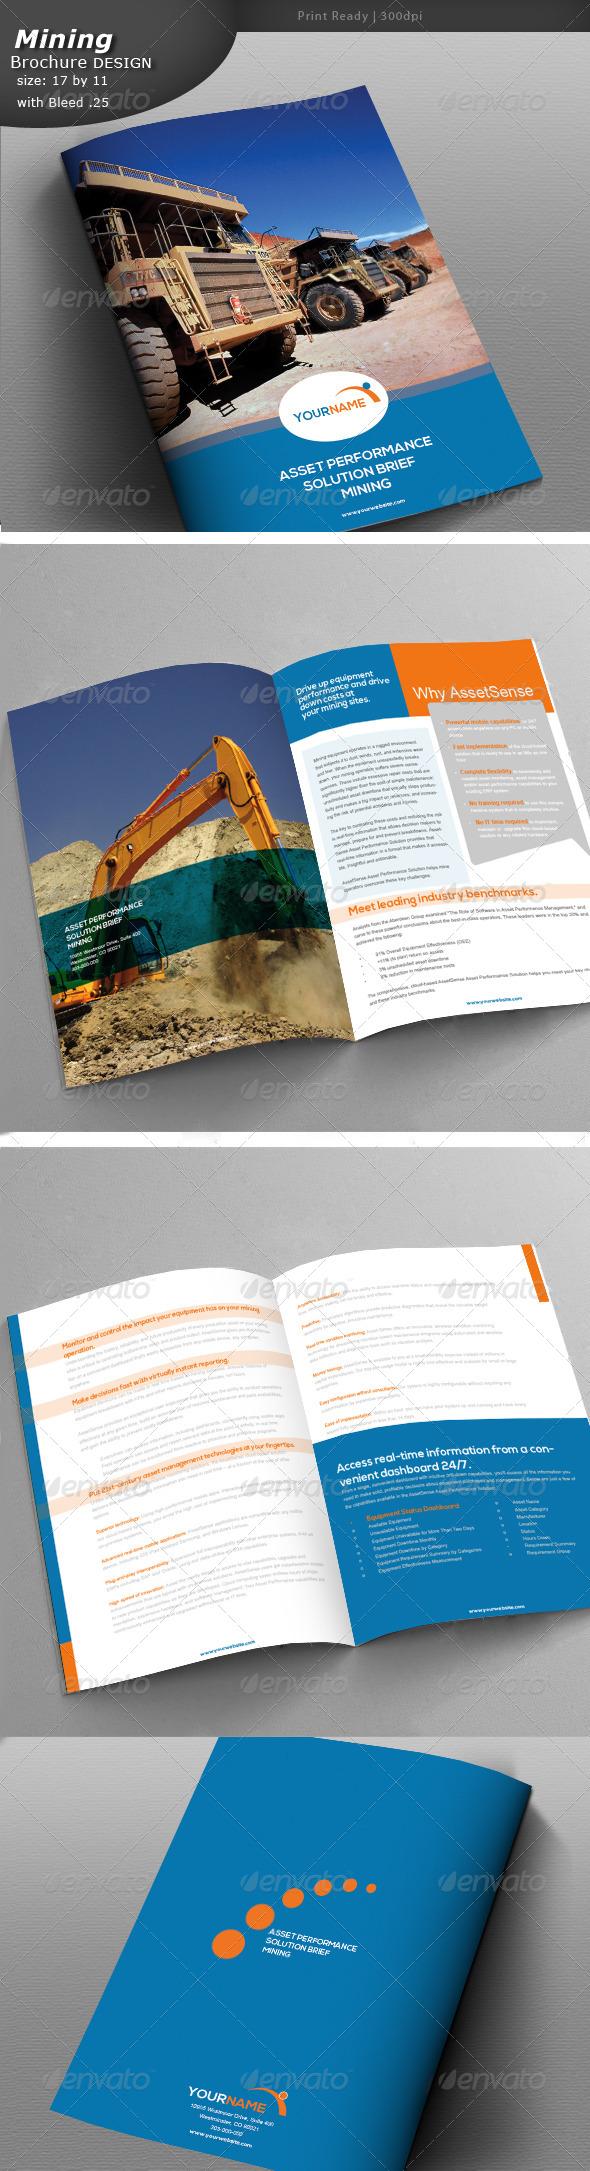 GraphicRiver Mining Brochure Design 5374808